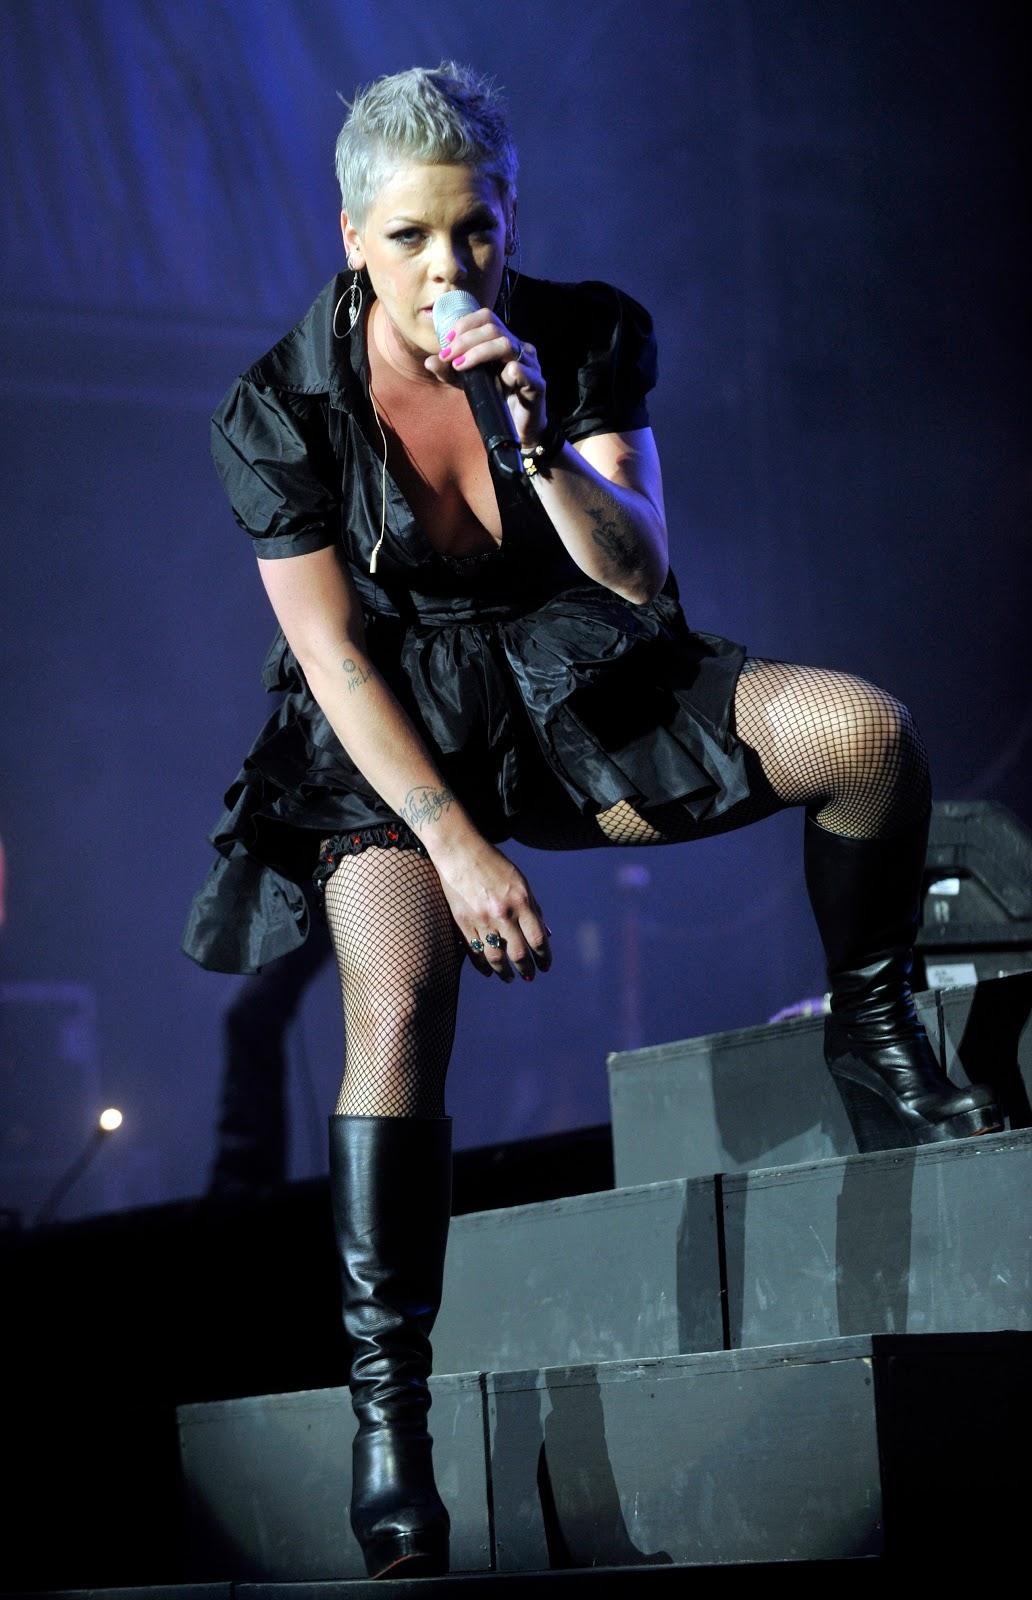 http://3.bp.blogspot.com/_LRzFEyAOGAA/TPUTjwadExI/AAAAAAAADGQ/JwBbaiguI9s/s1600/c815j1xllz-pink-live-in-concert-at-rheinenergiesta.jpg